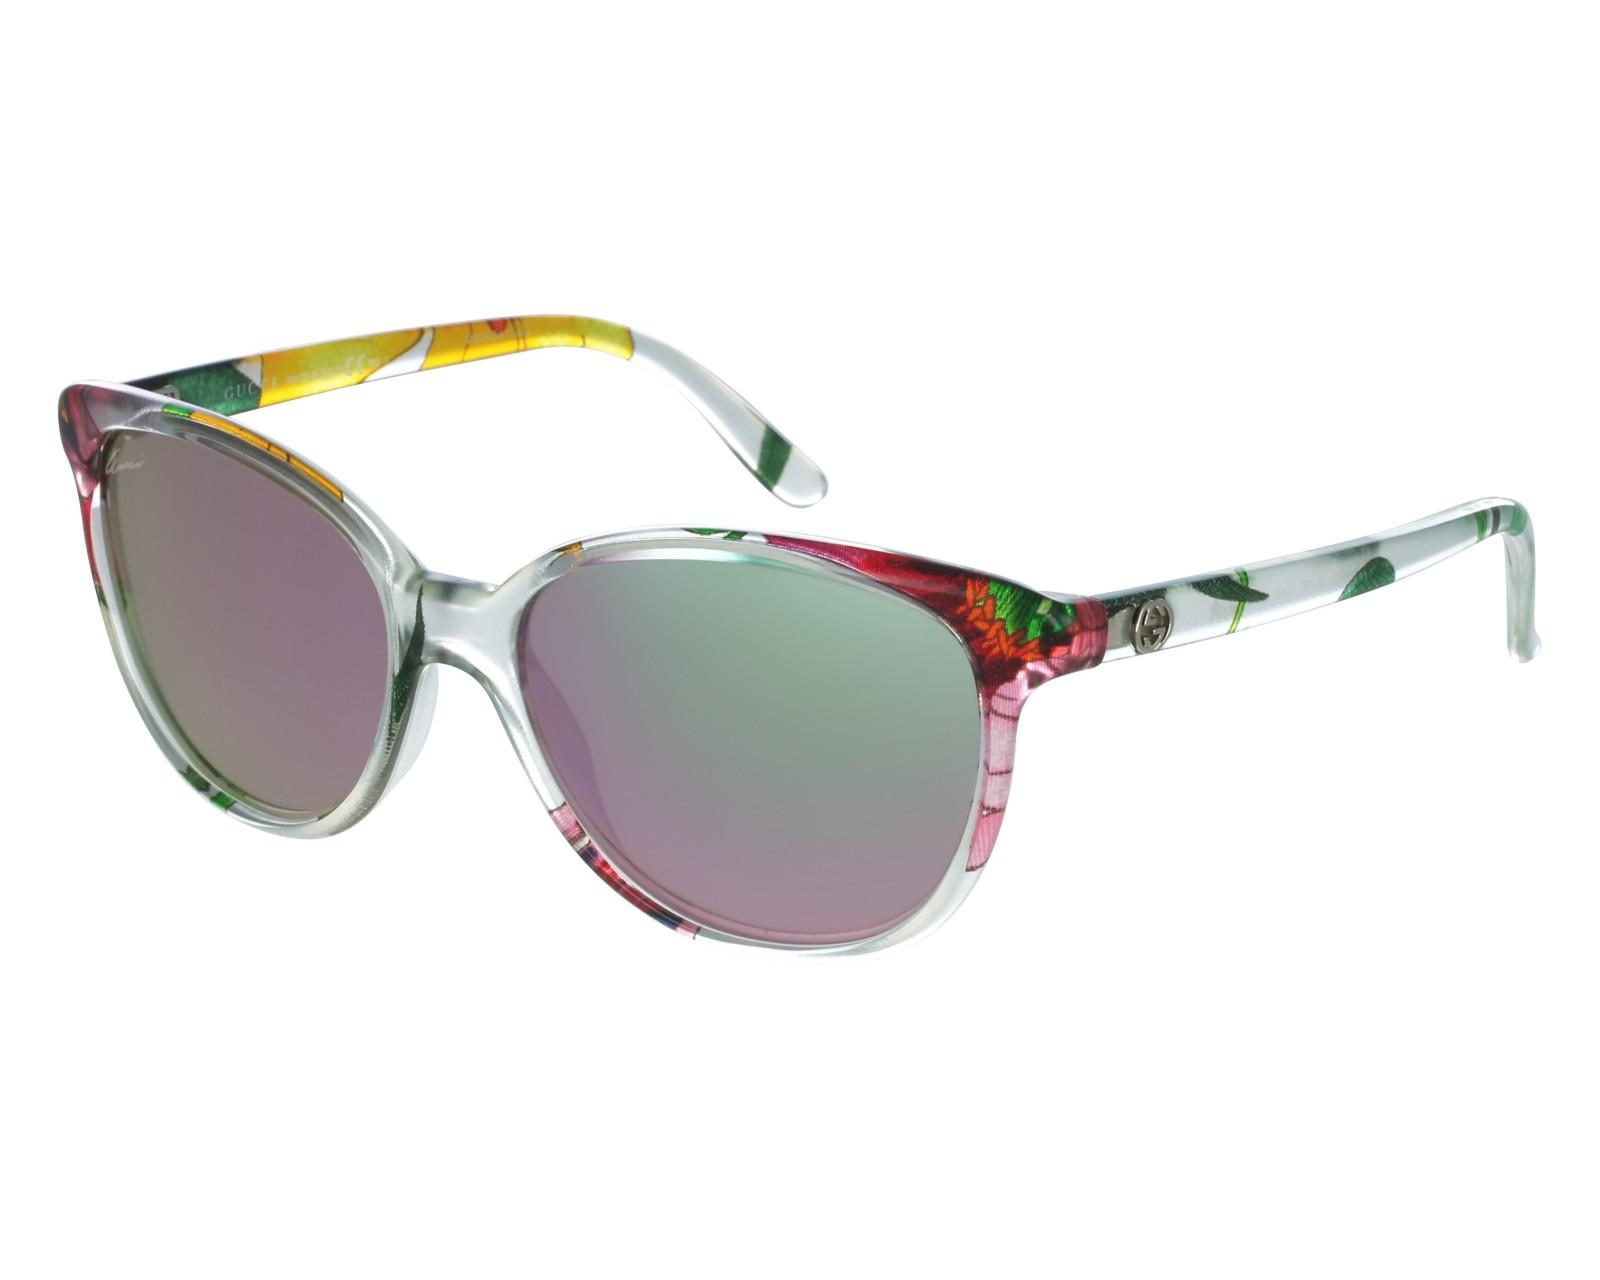 efb8802141 thumbnail Sunglasses Gucci GG-3633-NS ZE5 3E - Crystal front view